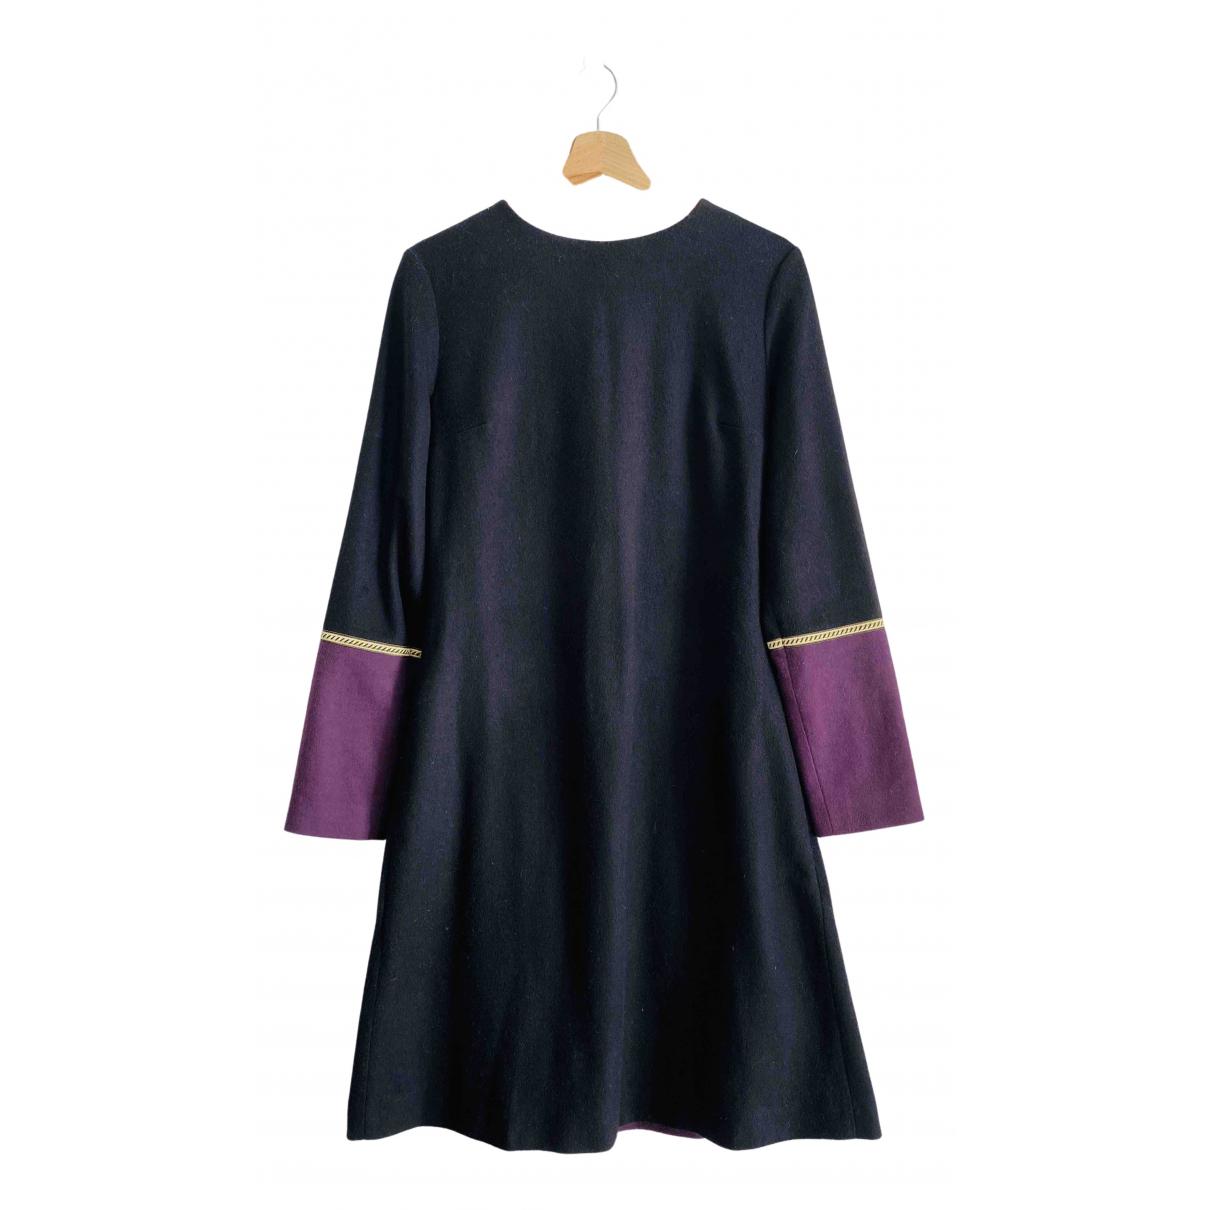 Tommy Hilfiger N Black Wool dress for Women 36 FR